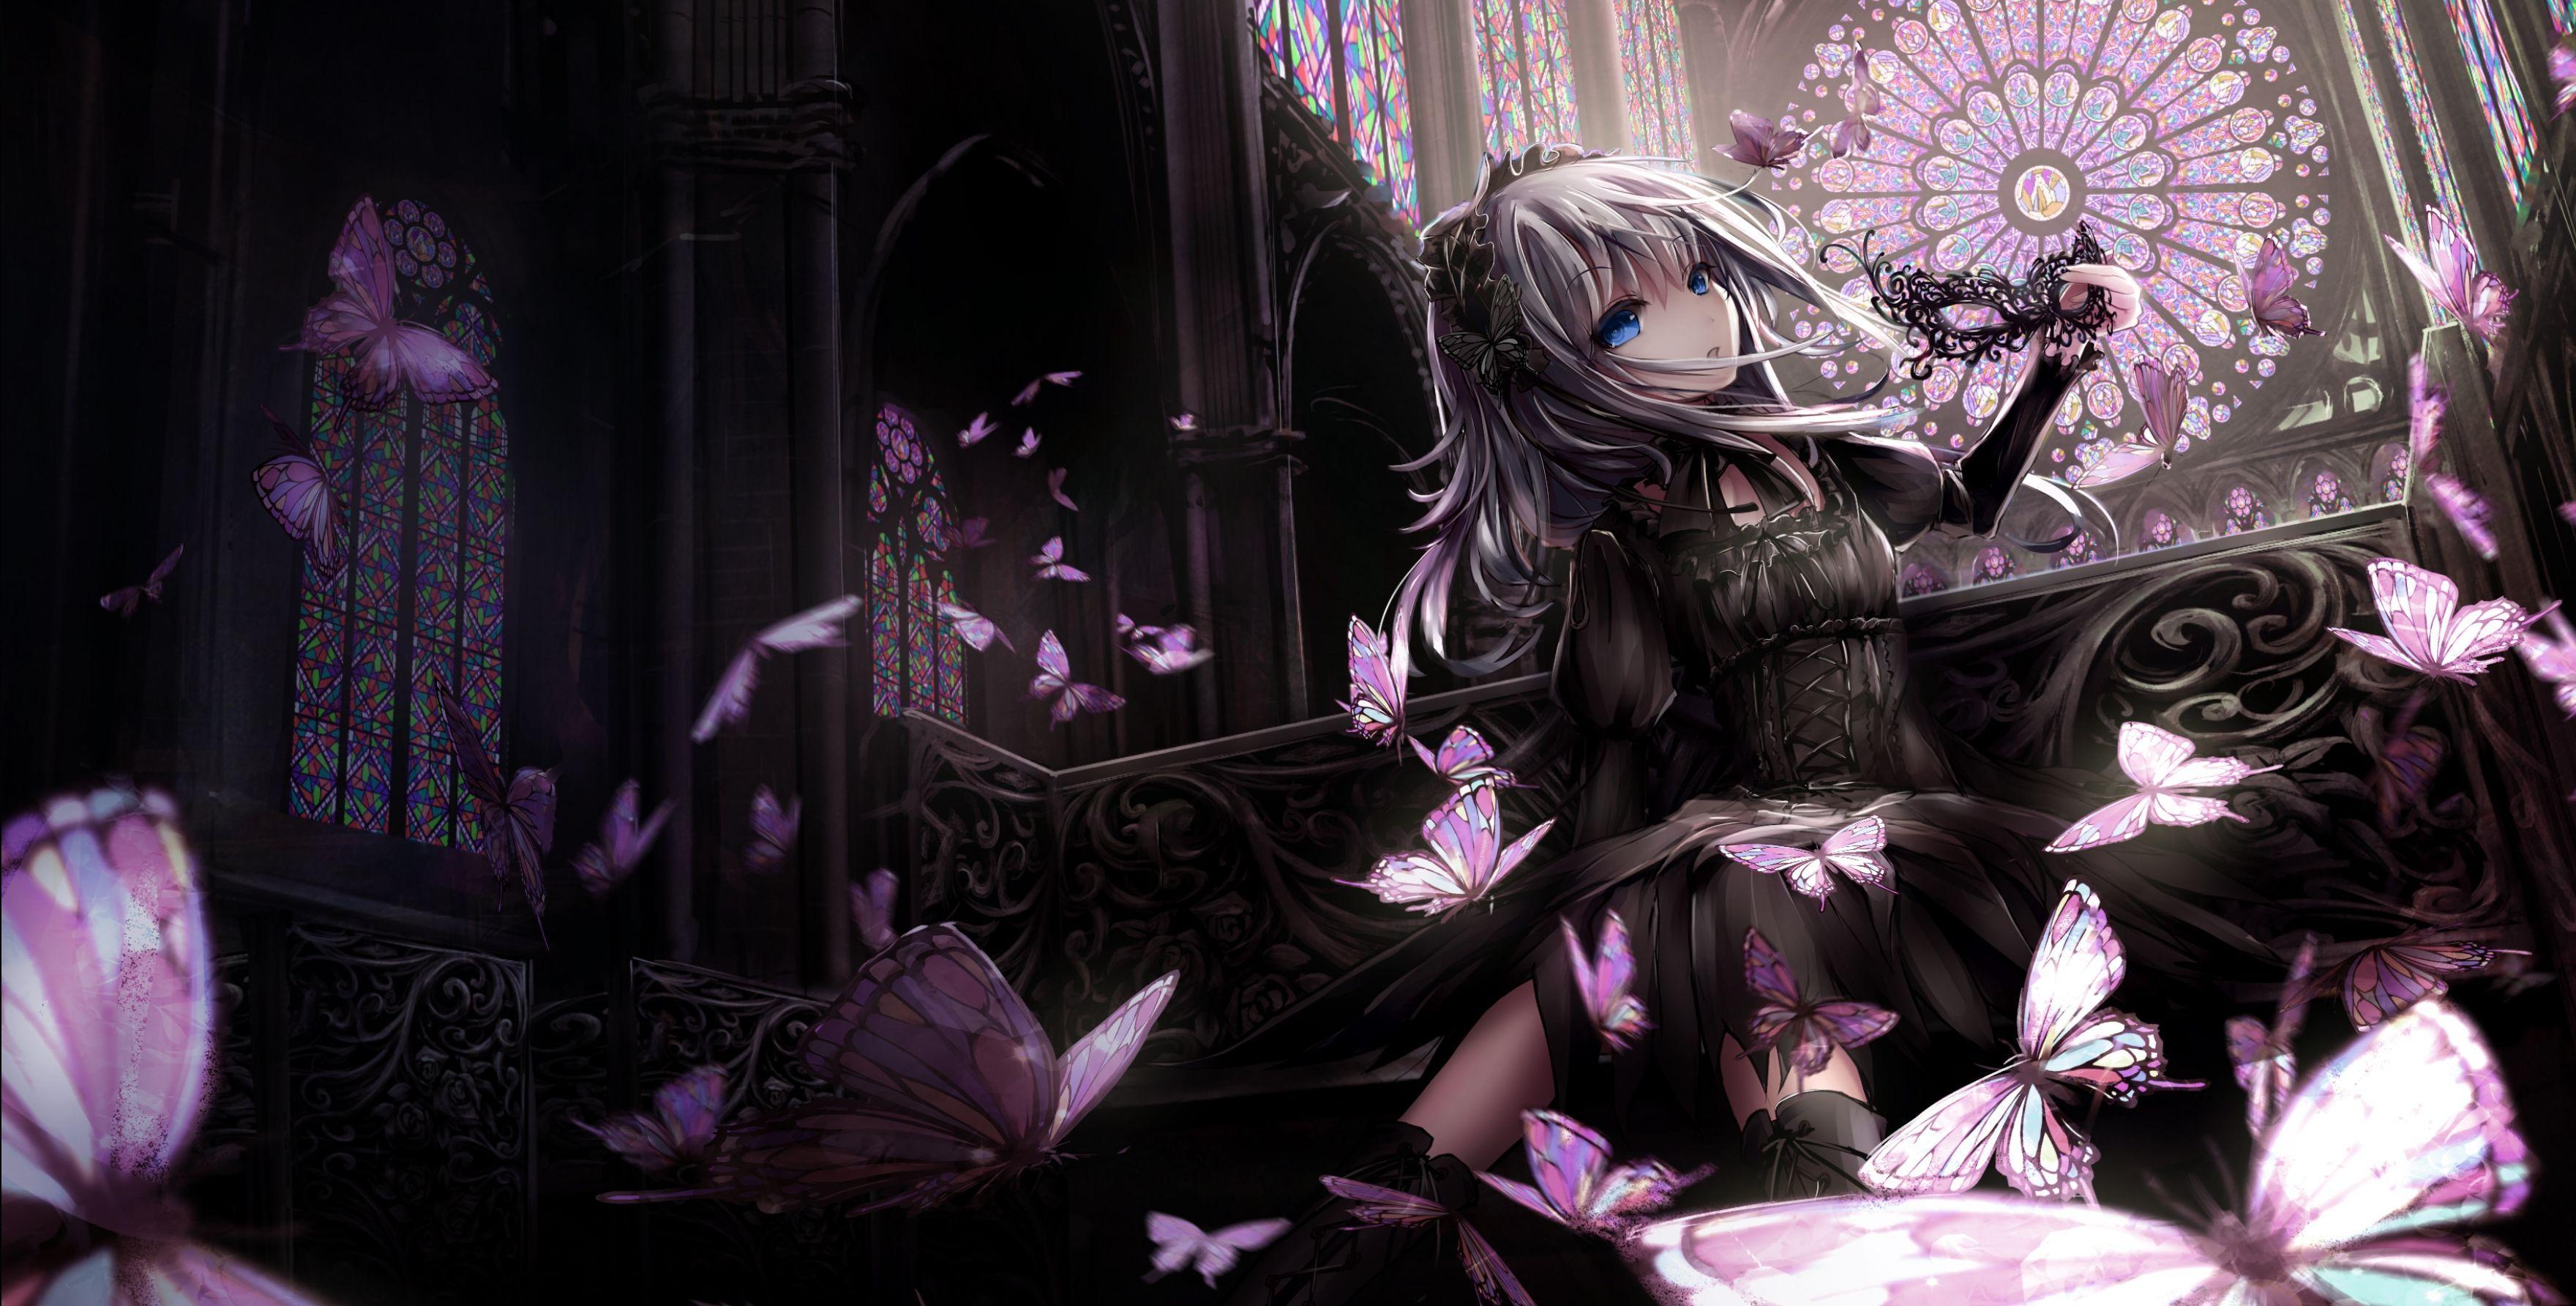 Gothic anime wallpapers top free gothic anime - Dark anime girl pics ...